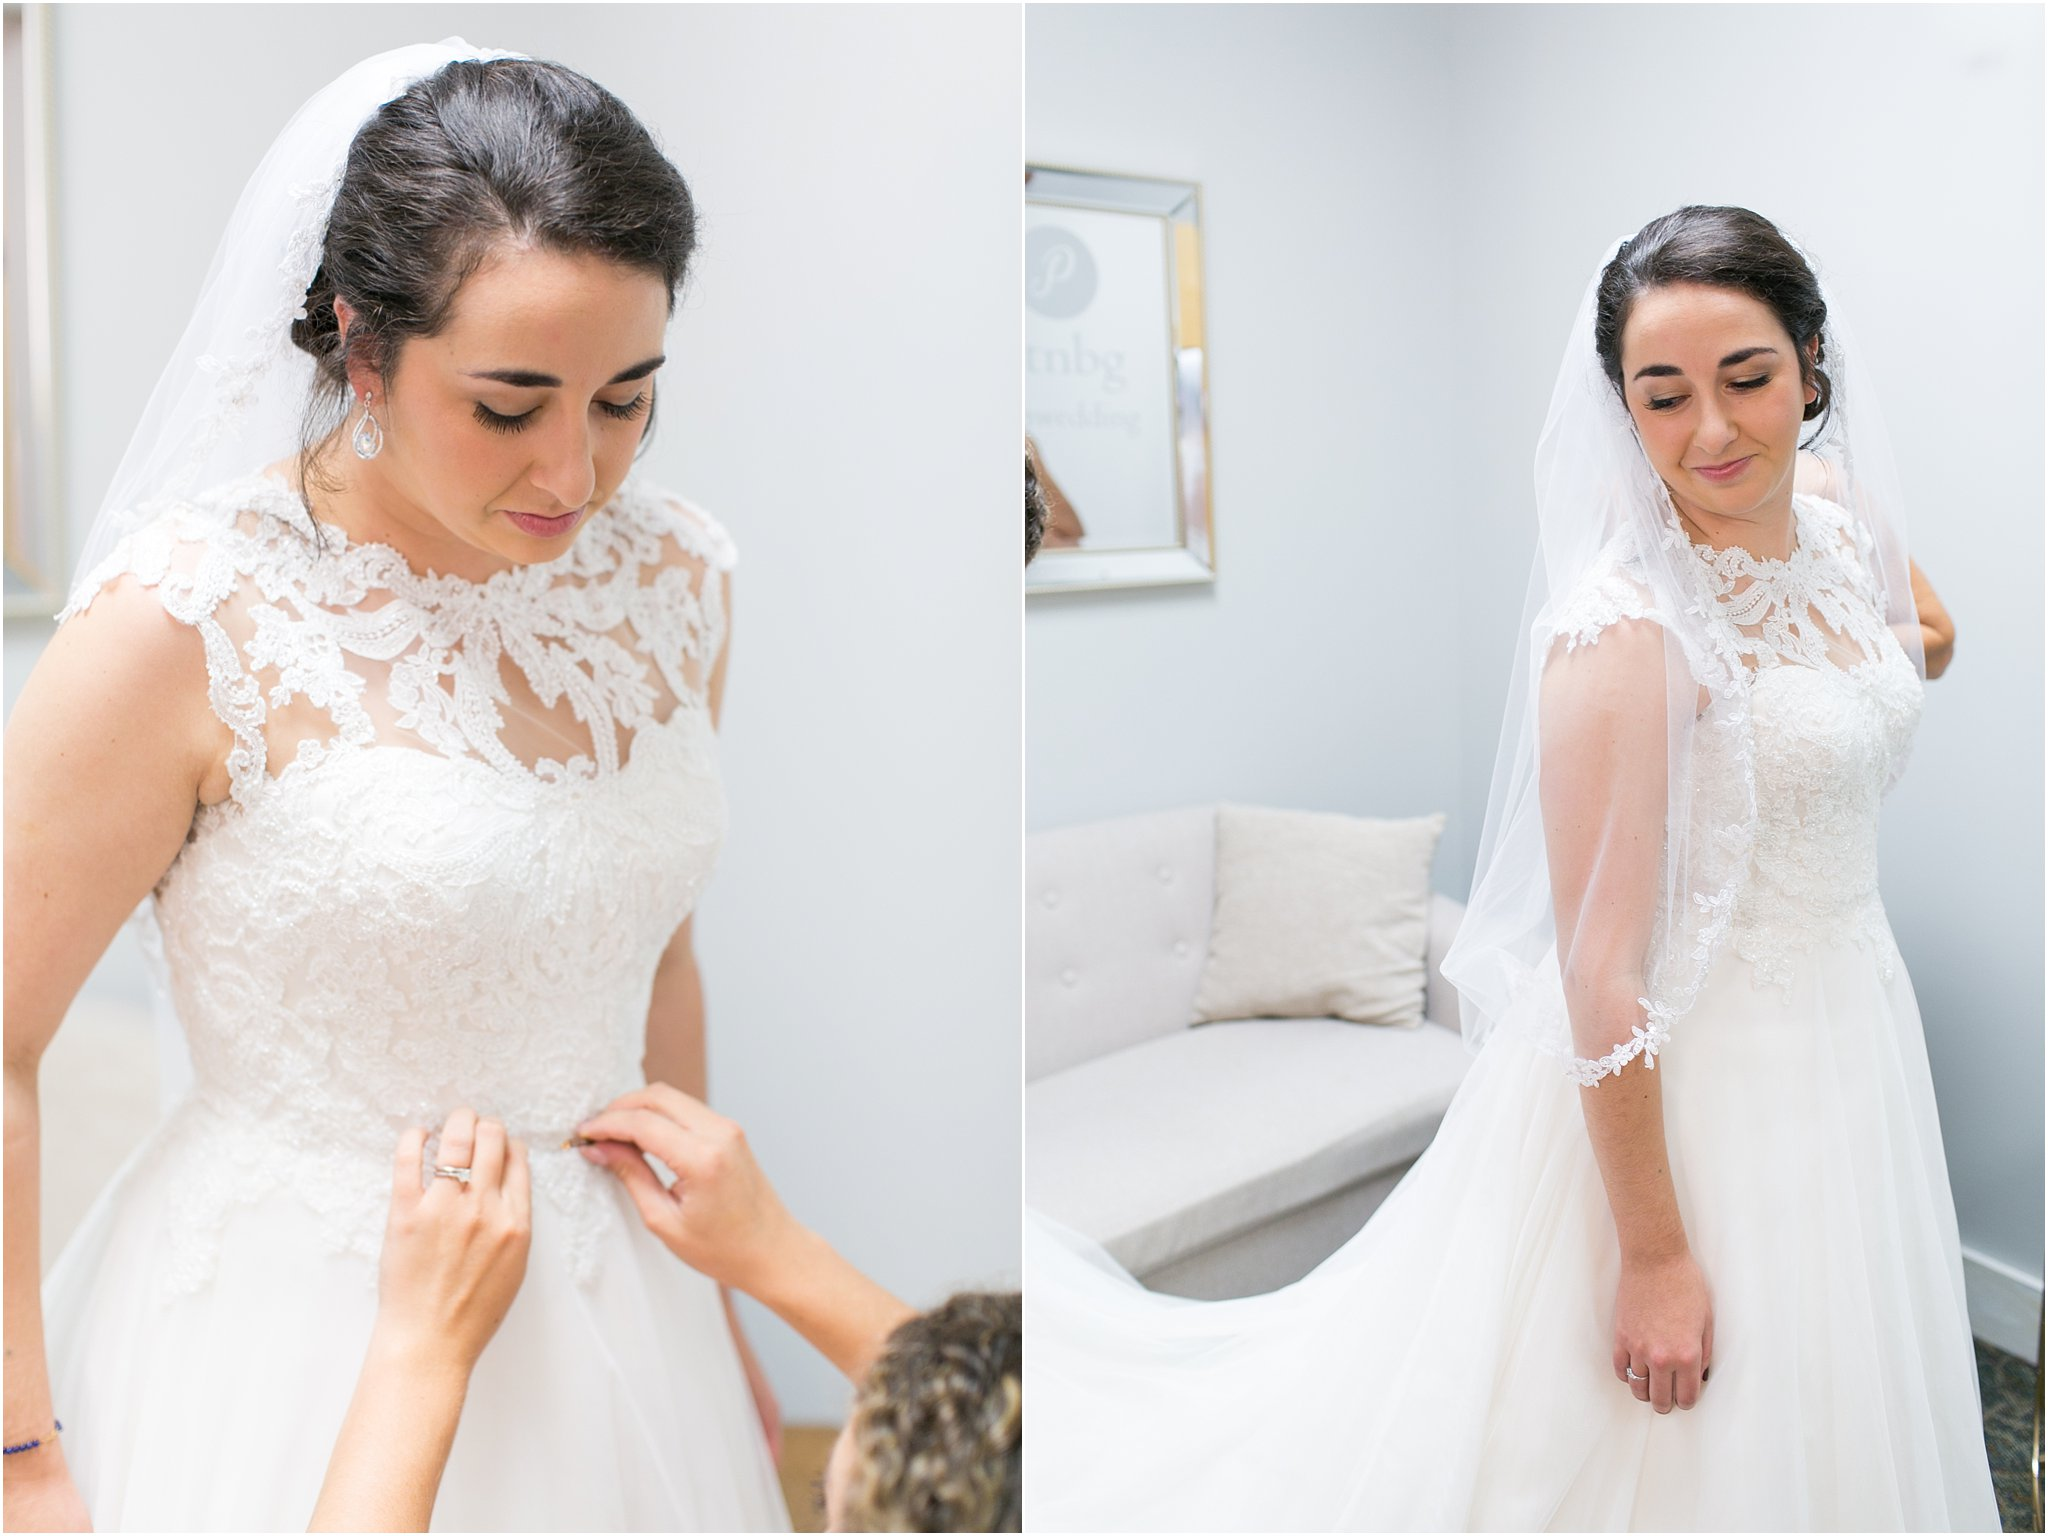 jessica_ryan_photography_virginia_wedding_photographer_wedding_hurricane_norfolk_botanical_gardens_hurricane_matthew_wedding_3554